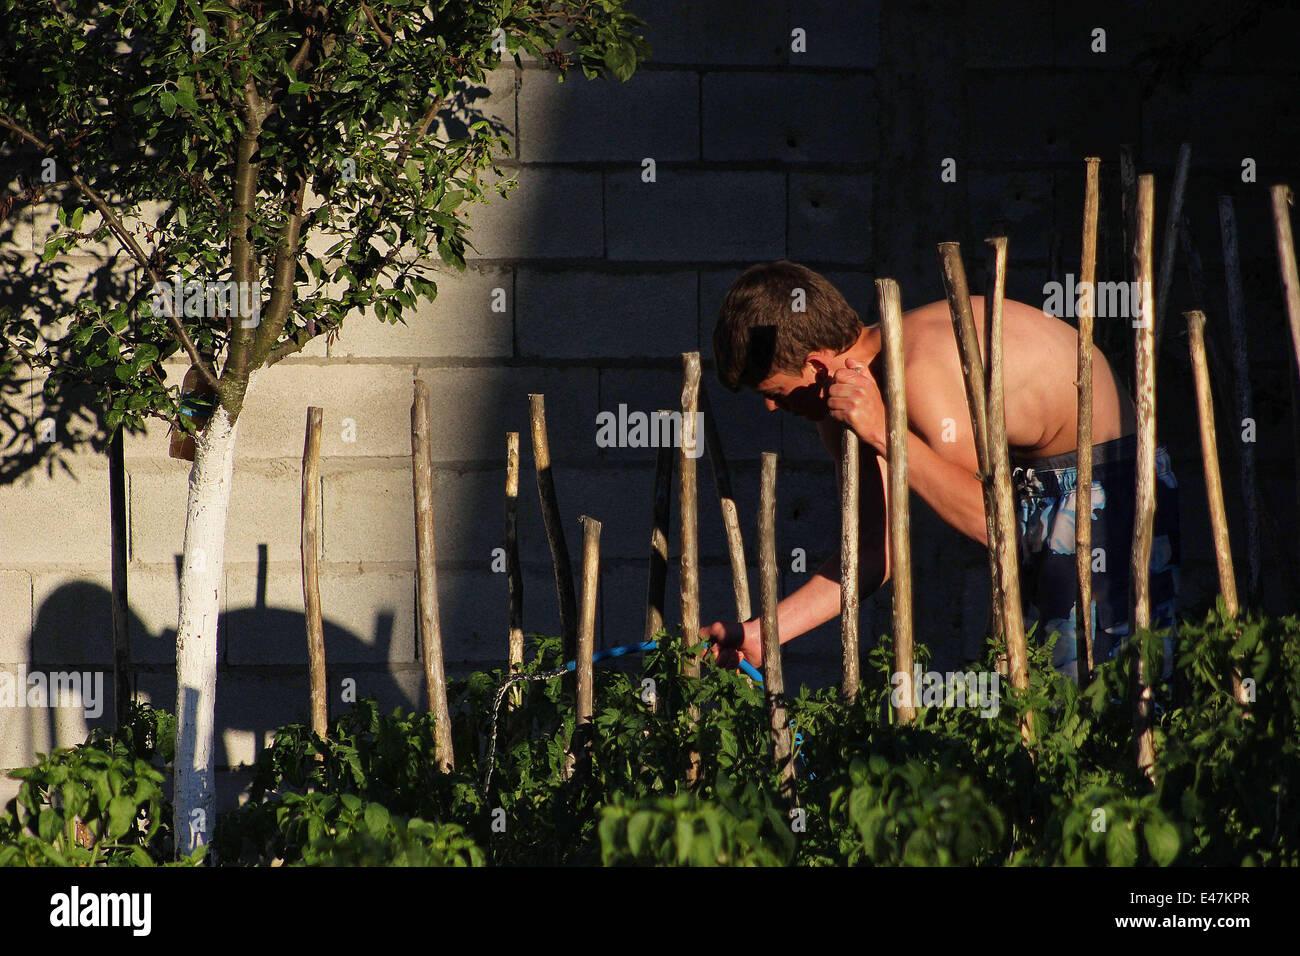 july 4 2014 kosovo arbnor beqiri 17 tending to his family u0027s